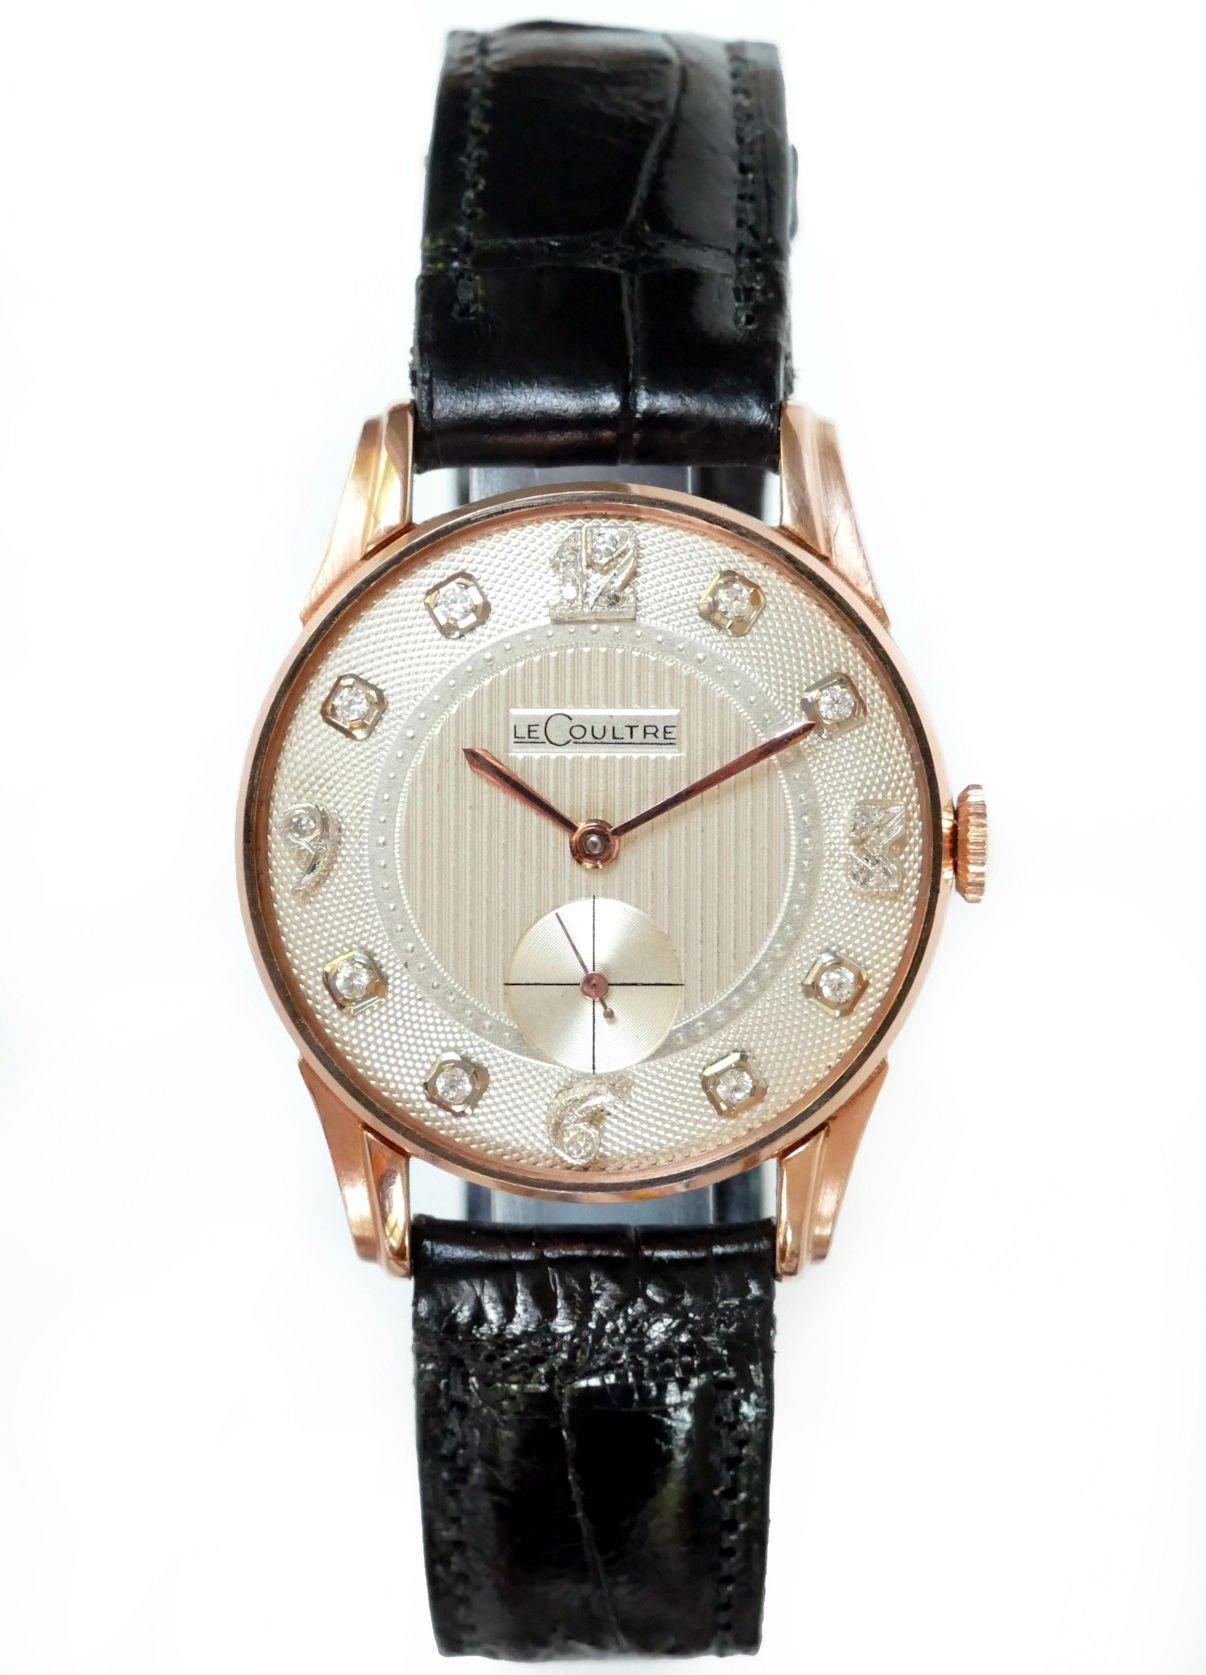 lecoultre diamond dial rose gold men 39 s watch 1950 39 s. Black Bedroom Furniture Sets. Home Design Ideas